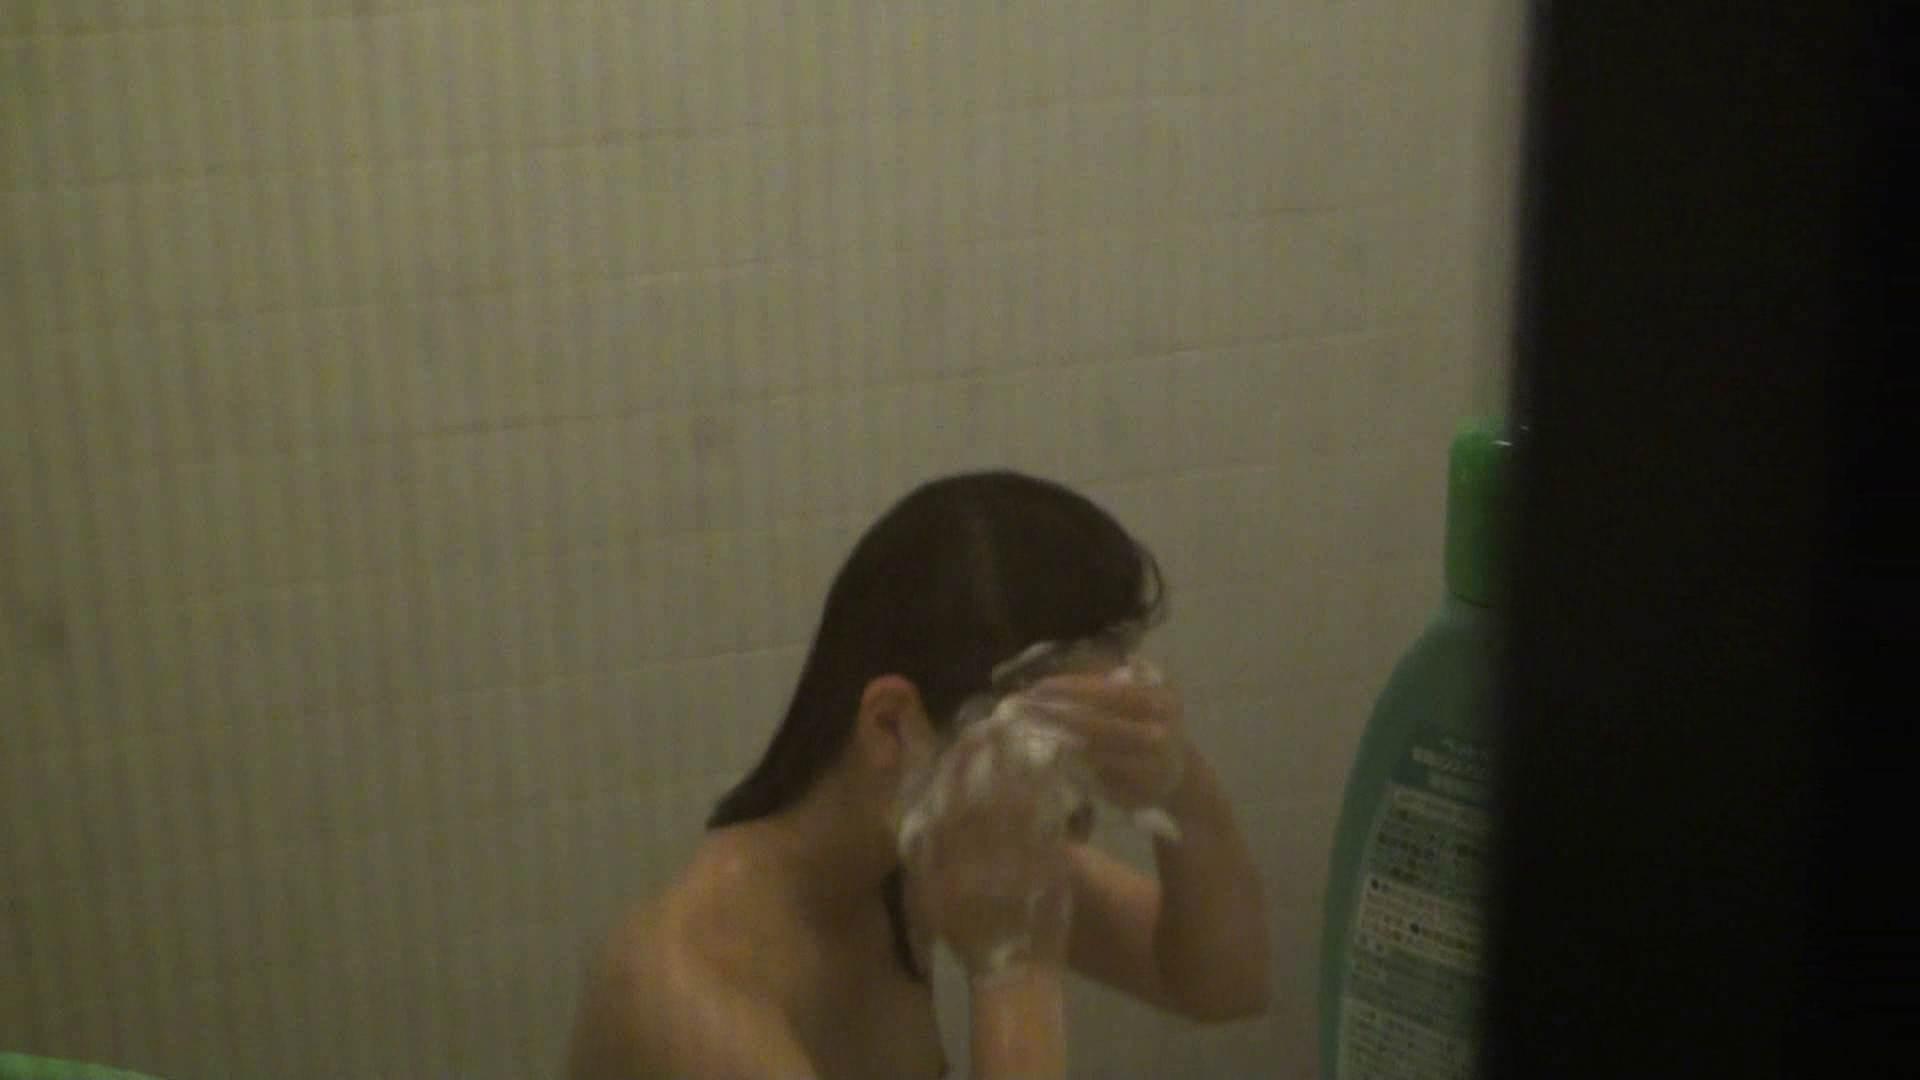 vol.06顔を洗い流す極上お女市さんの裸体をハイビジョンで!風呂上り着替え必見! 民家 オメコ動画キャプチャ 84pic 31